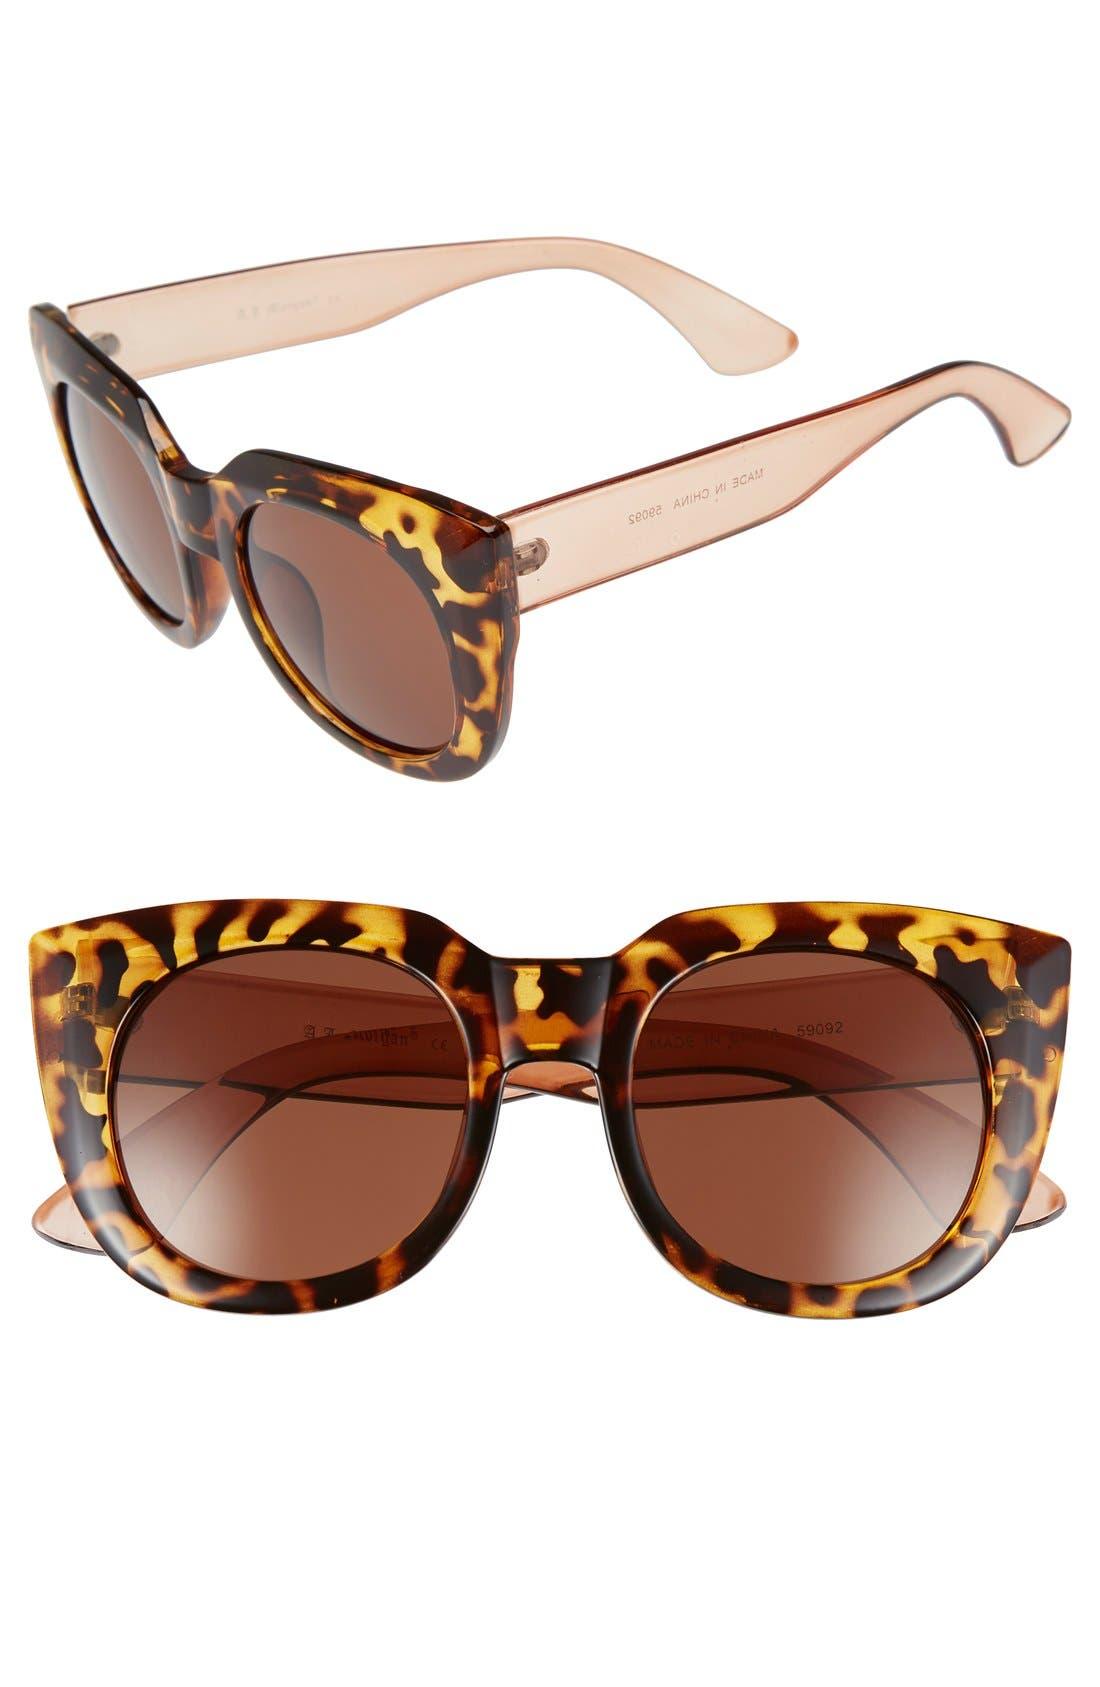 Alternate Image 1 Selected - A.J. Morgan 'Beam' 50mm Sunglasses